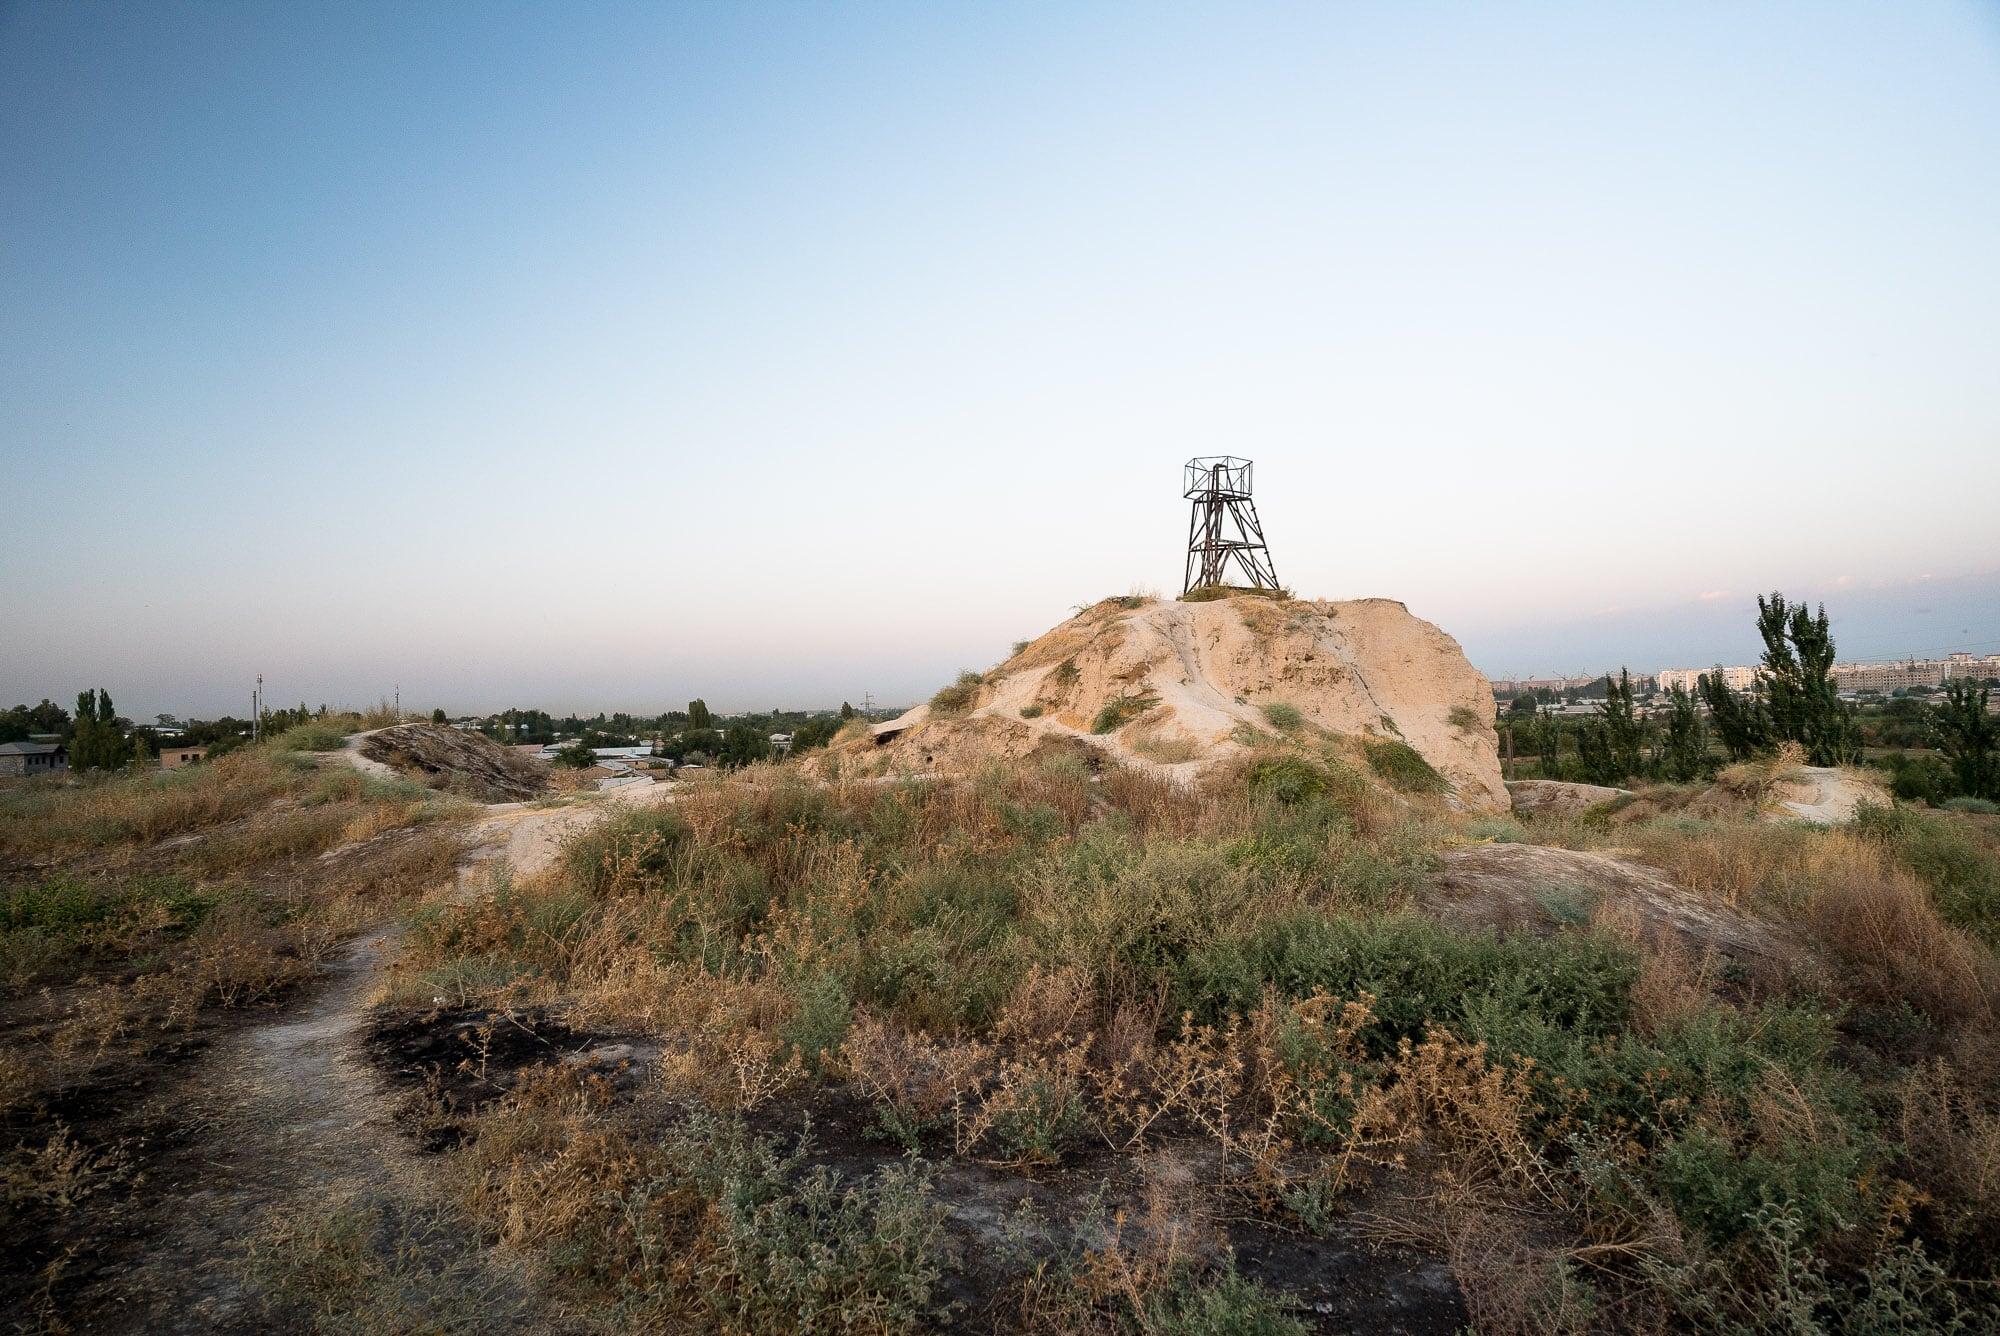 Shoshtepa Zoroastrian site